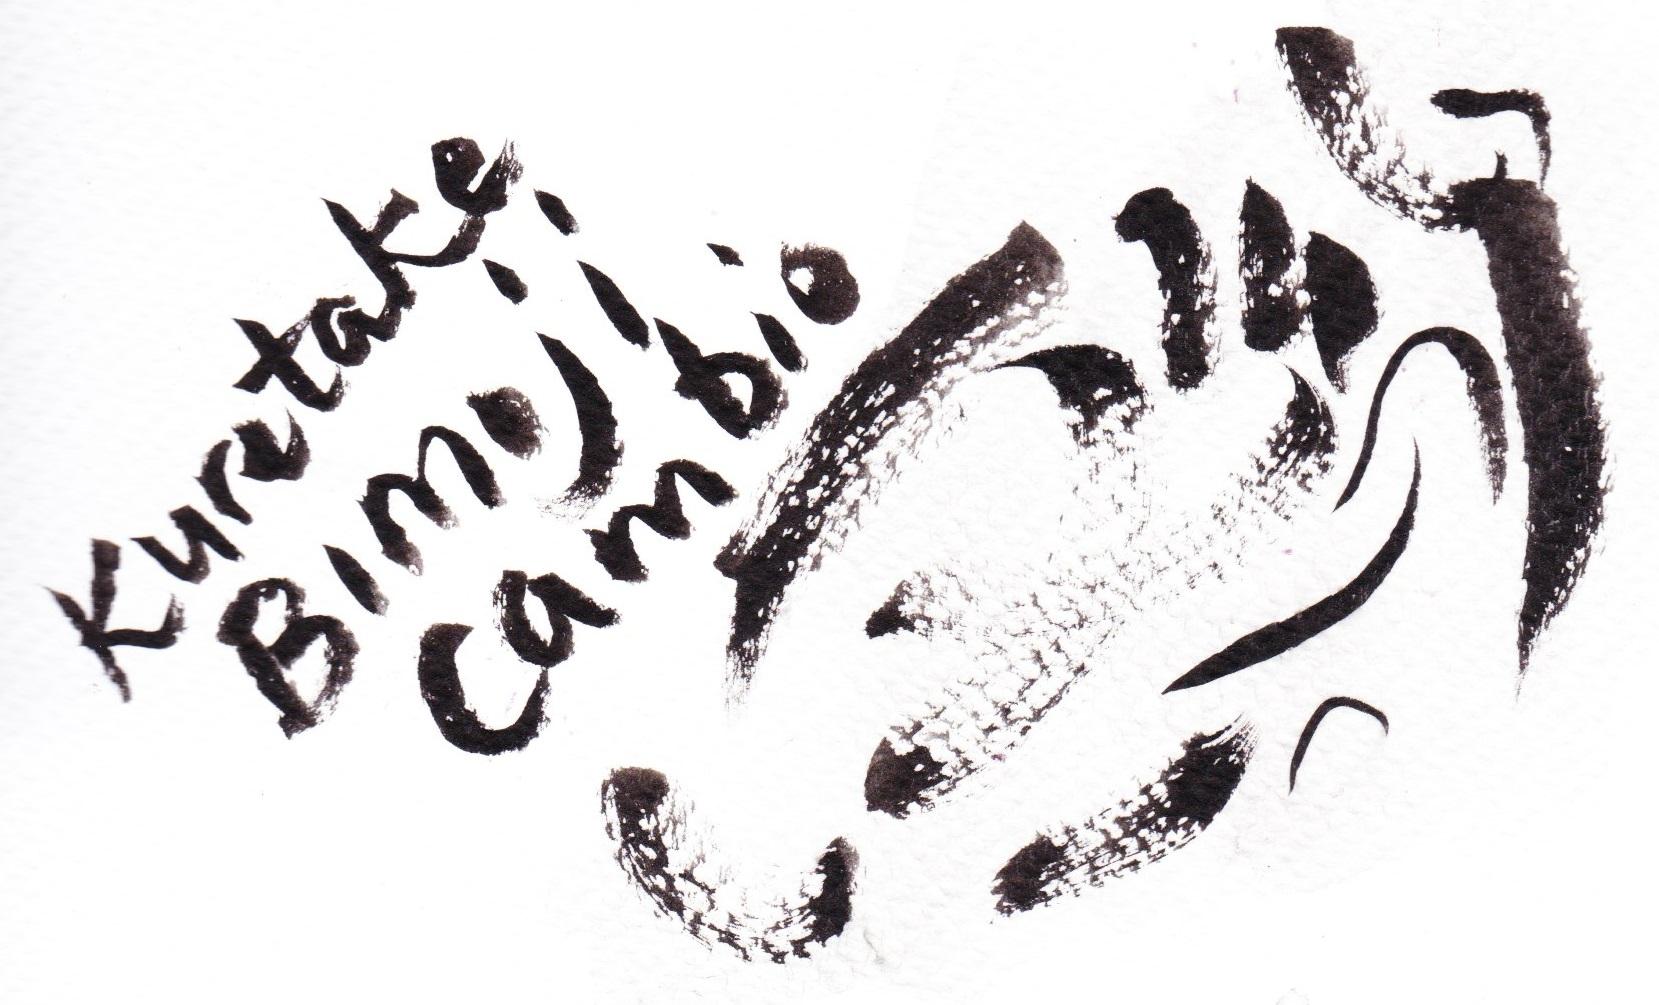 Kuretake Bimoji Cambio large on cold pressed paper